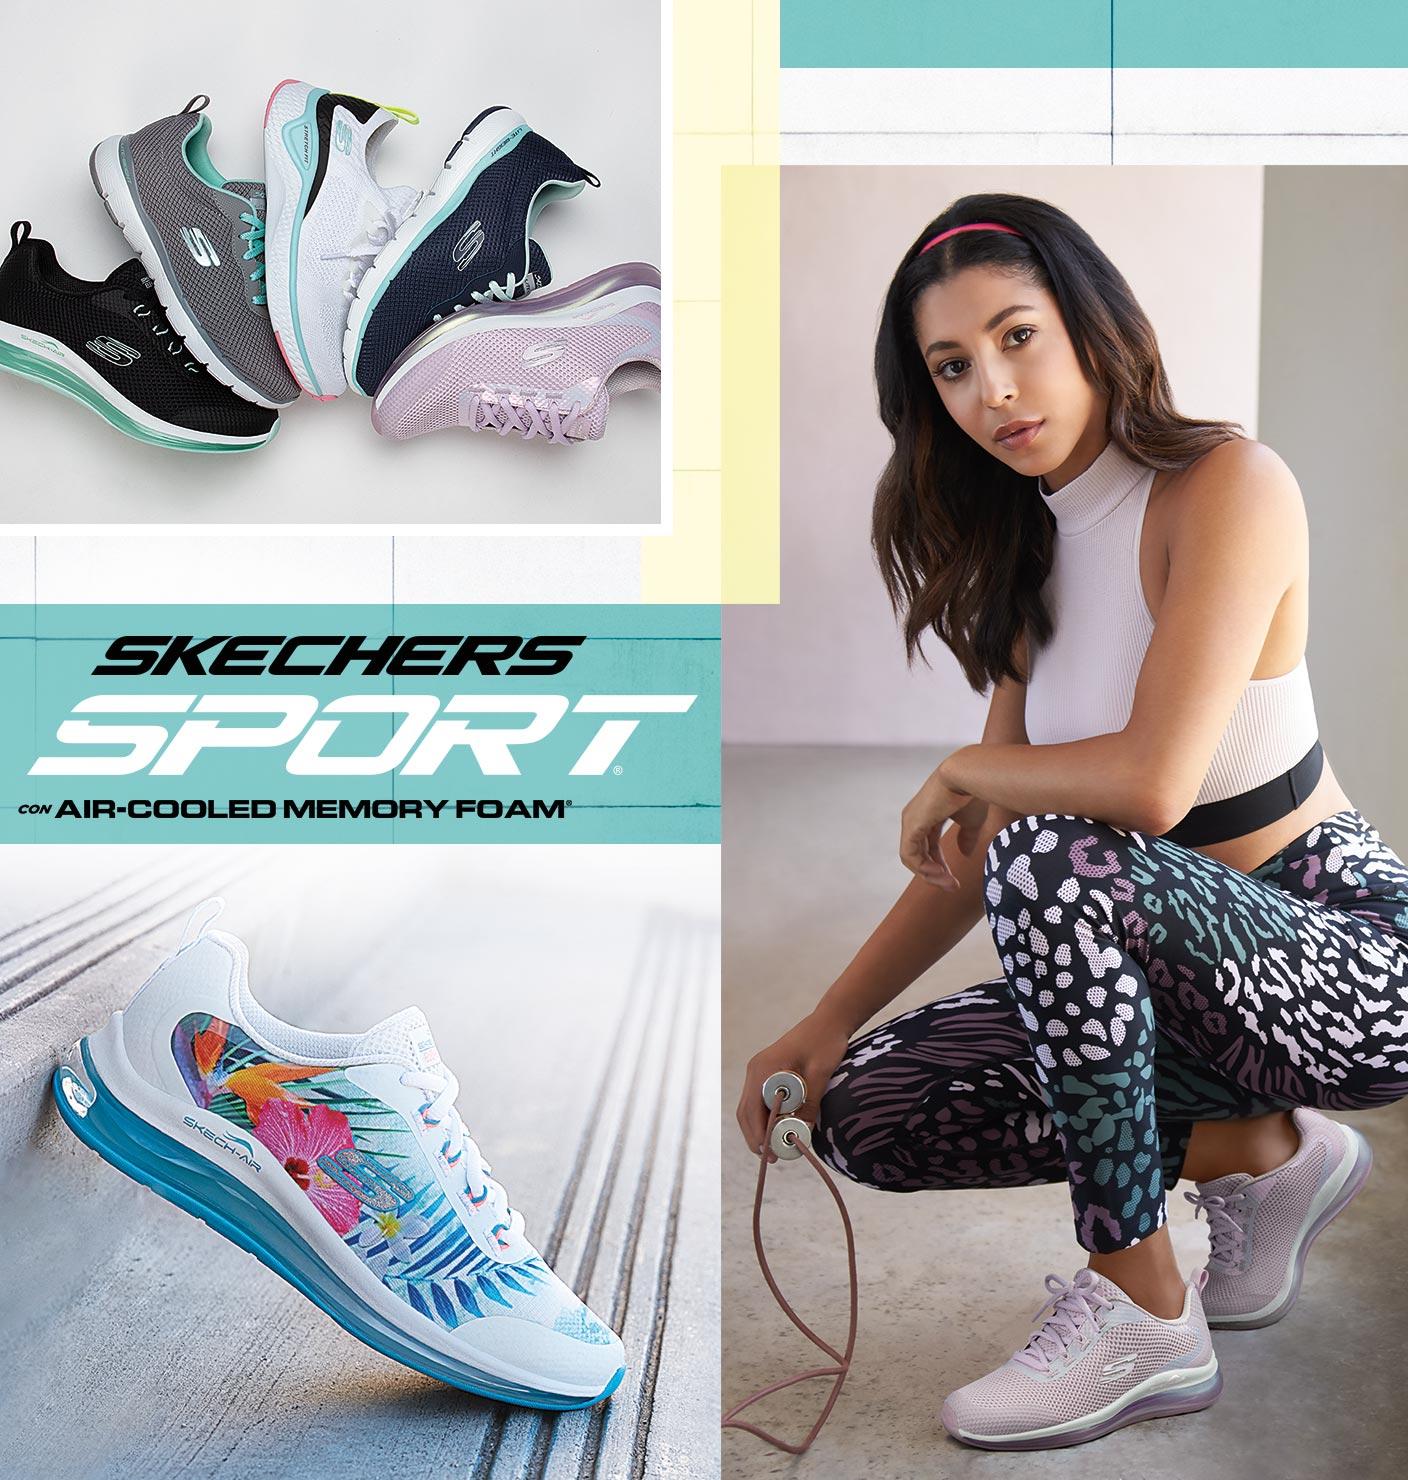 zapatillas skechers mujer verano 2019 xl zaragoza